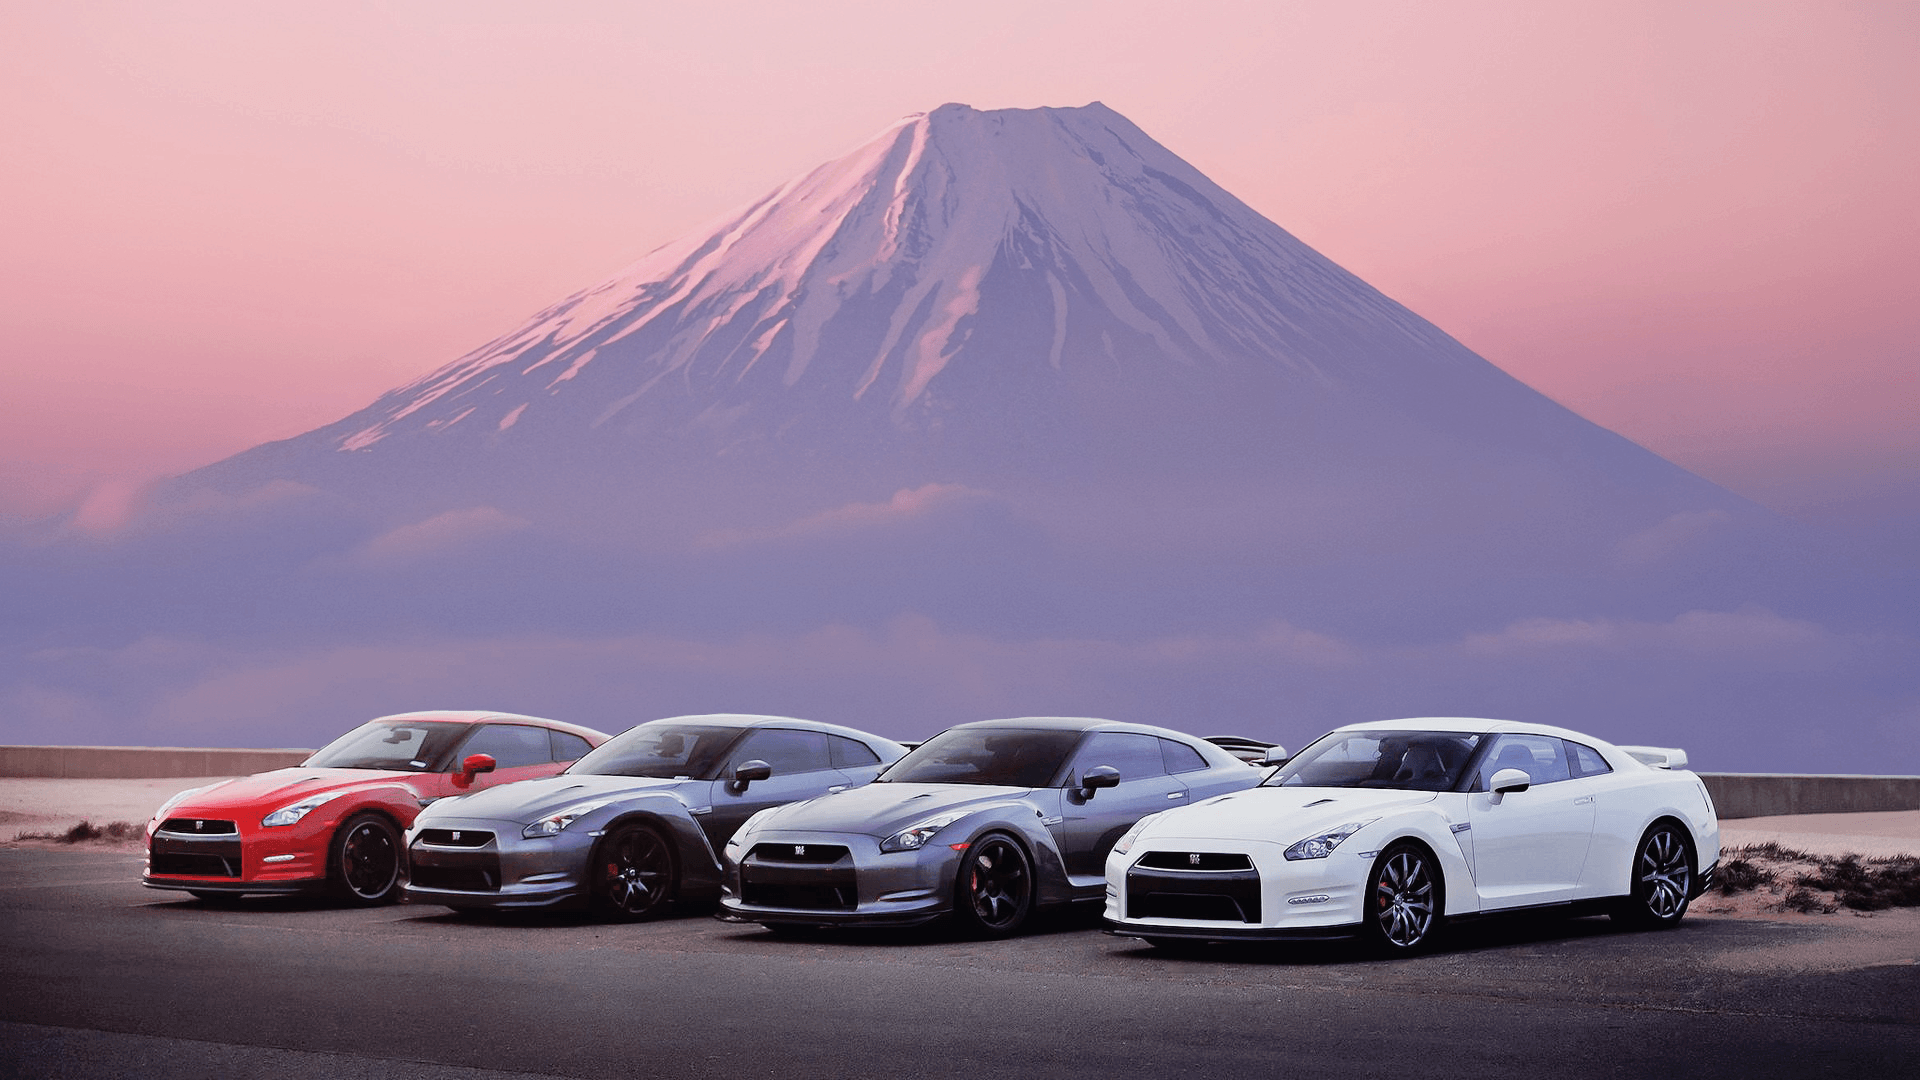 Nissan Japan Gtr Wallpapers Top Free Nissan Japan Gtr Backgrounds Wallpaperaccess